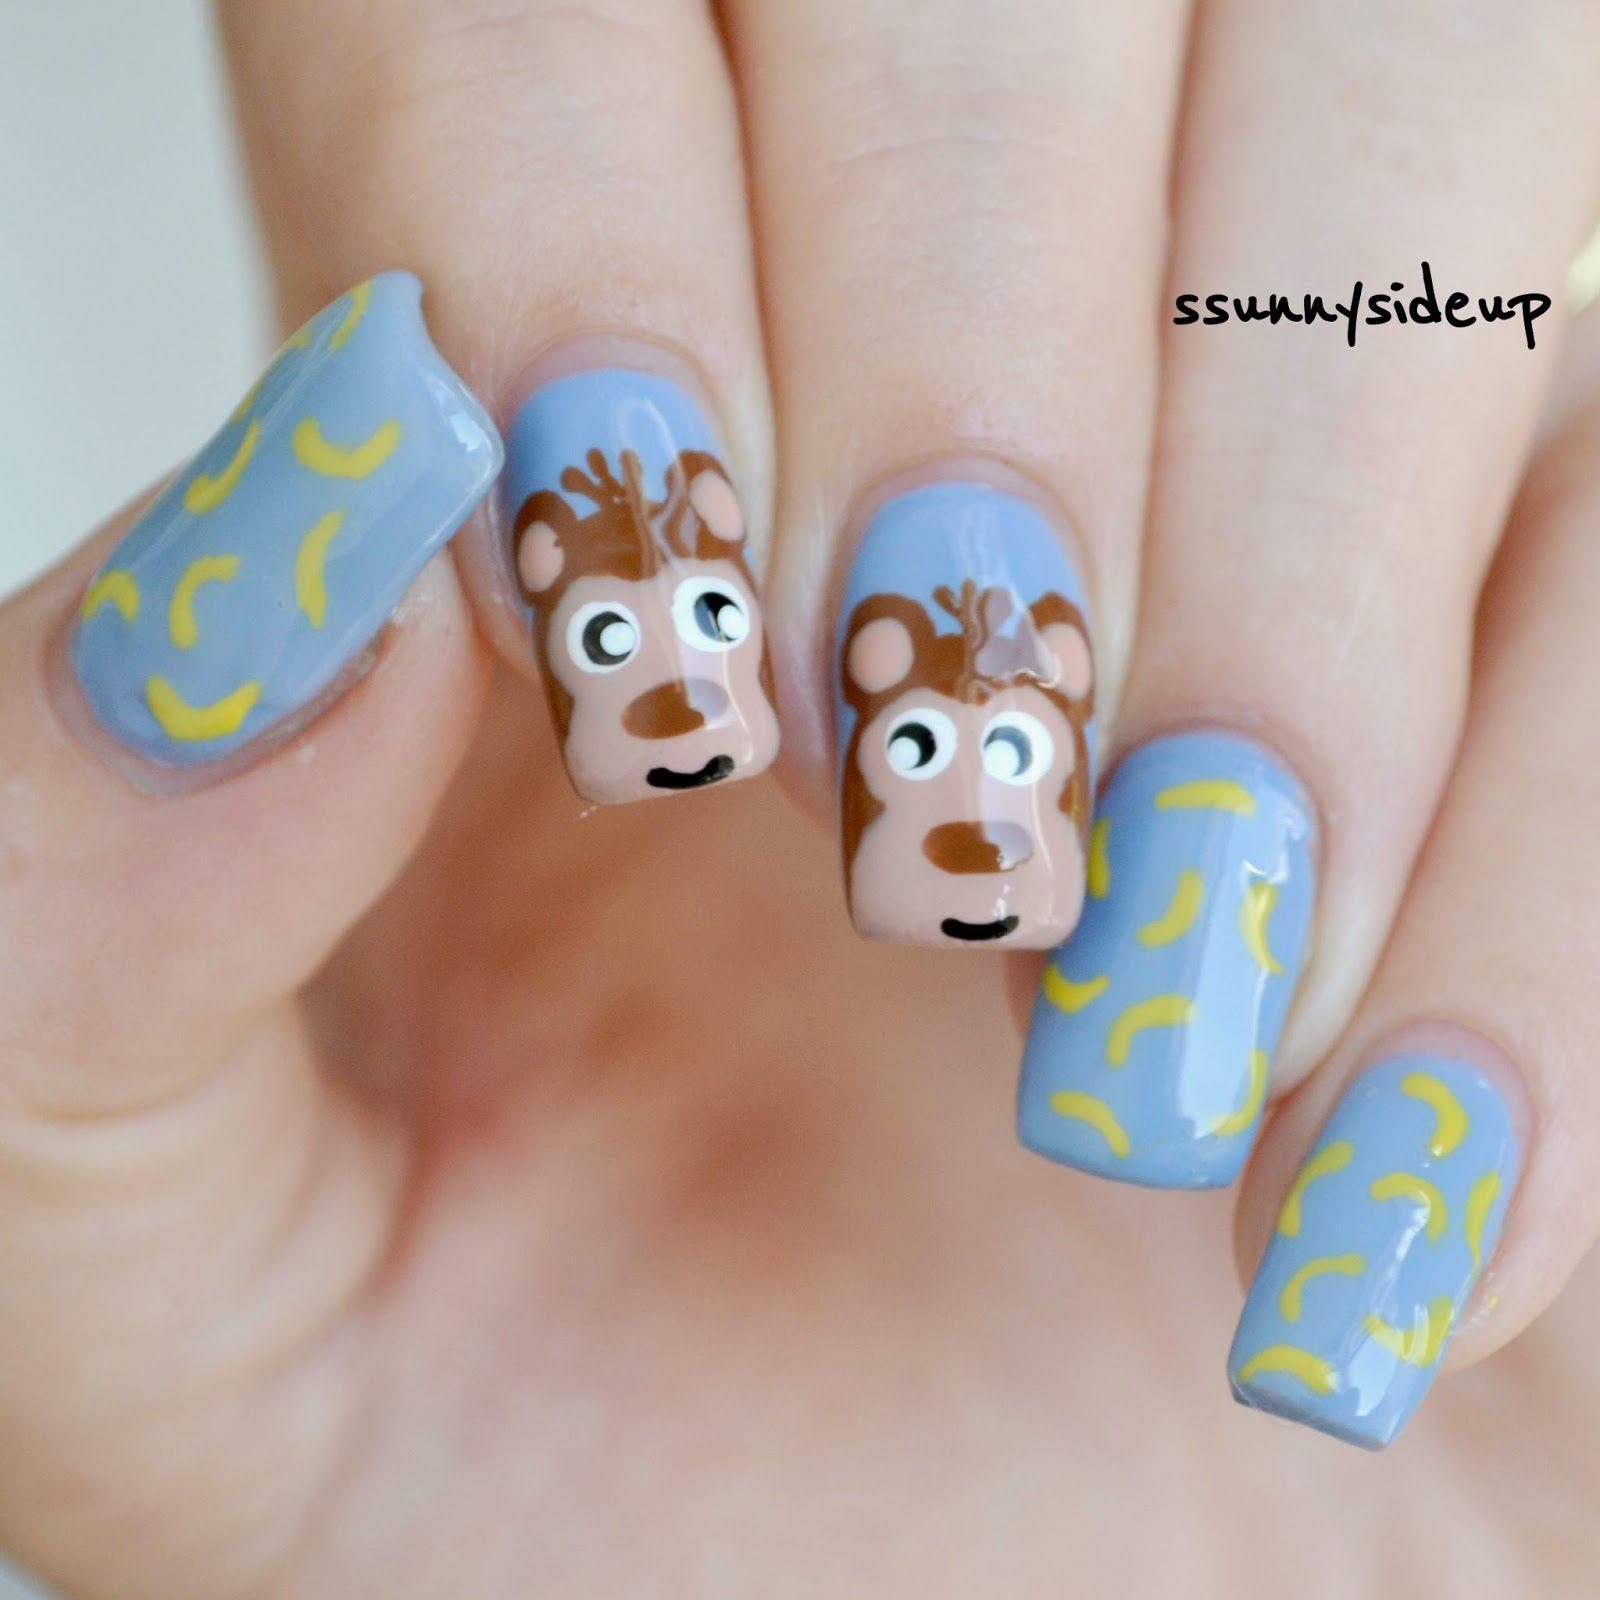 ssunnysideup: Monkey nails with kiko, china glaze and essence ...